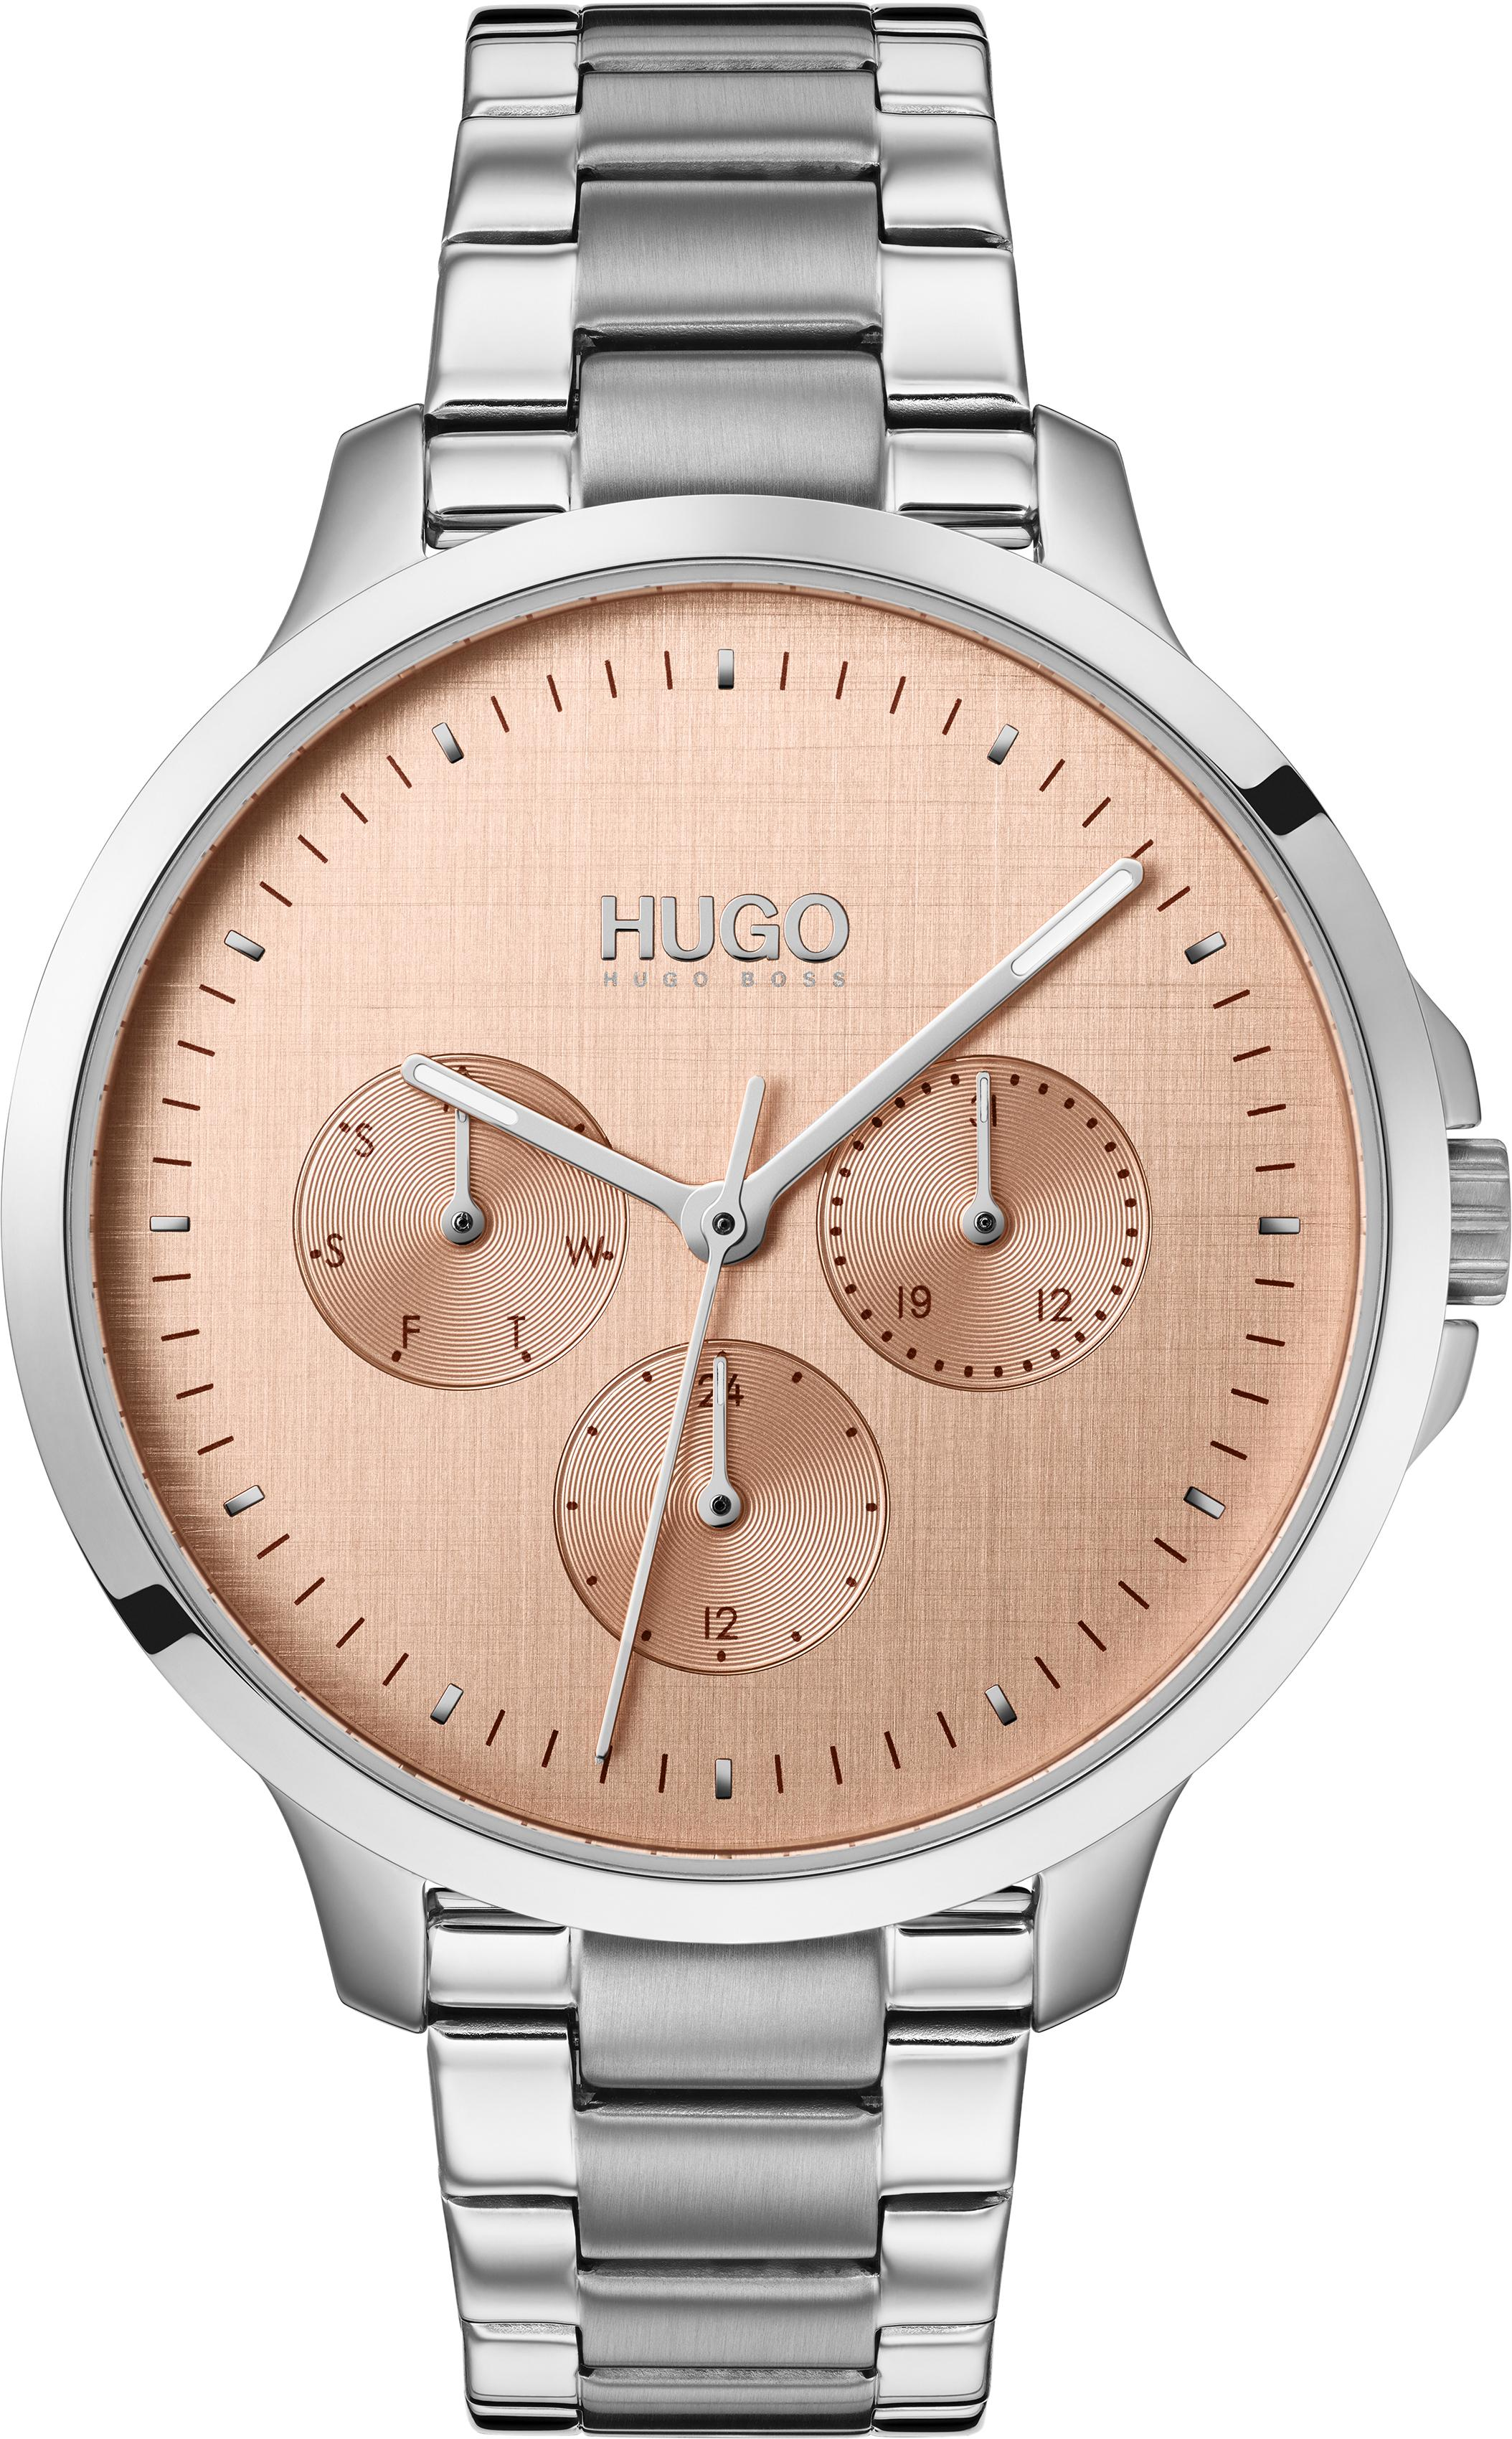 HUGO Multifunktionsuhr DESIRE 1540015 | Uhren > Multifunktionsuhren | Hugo